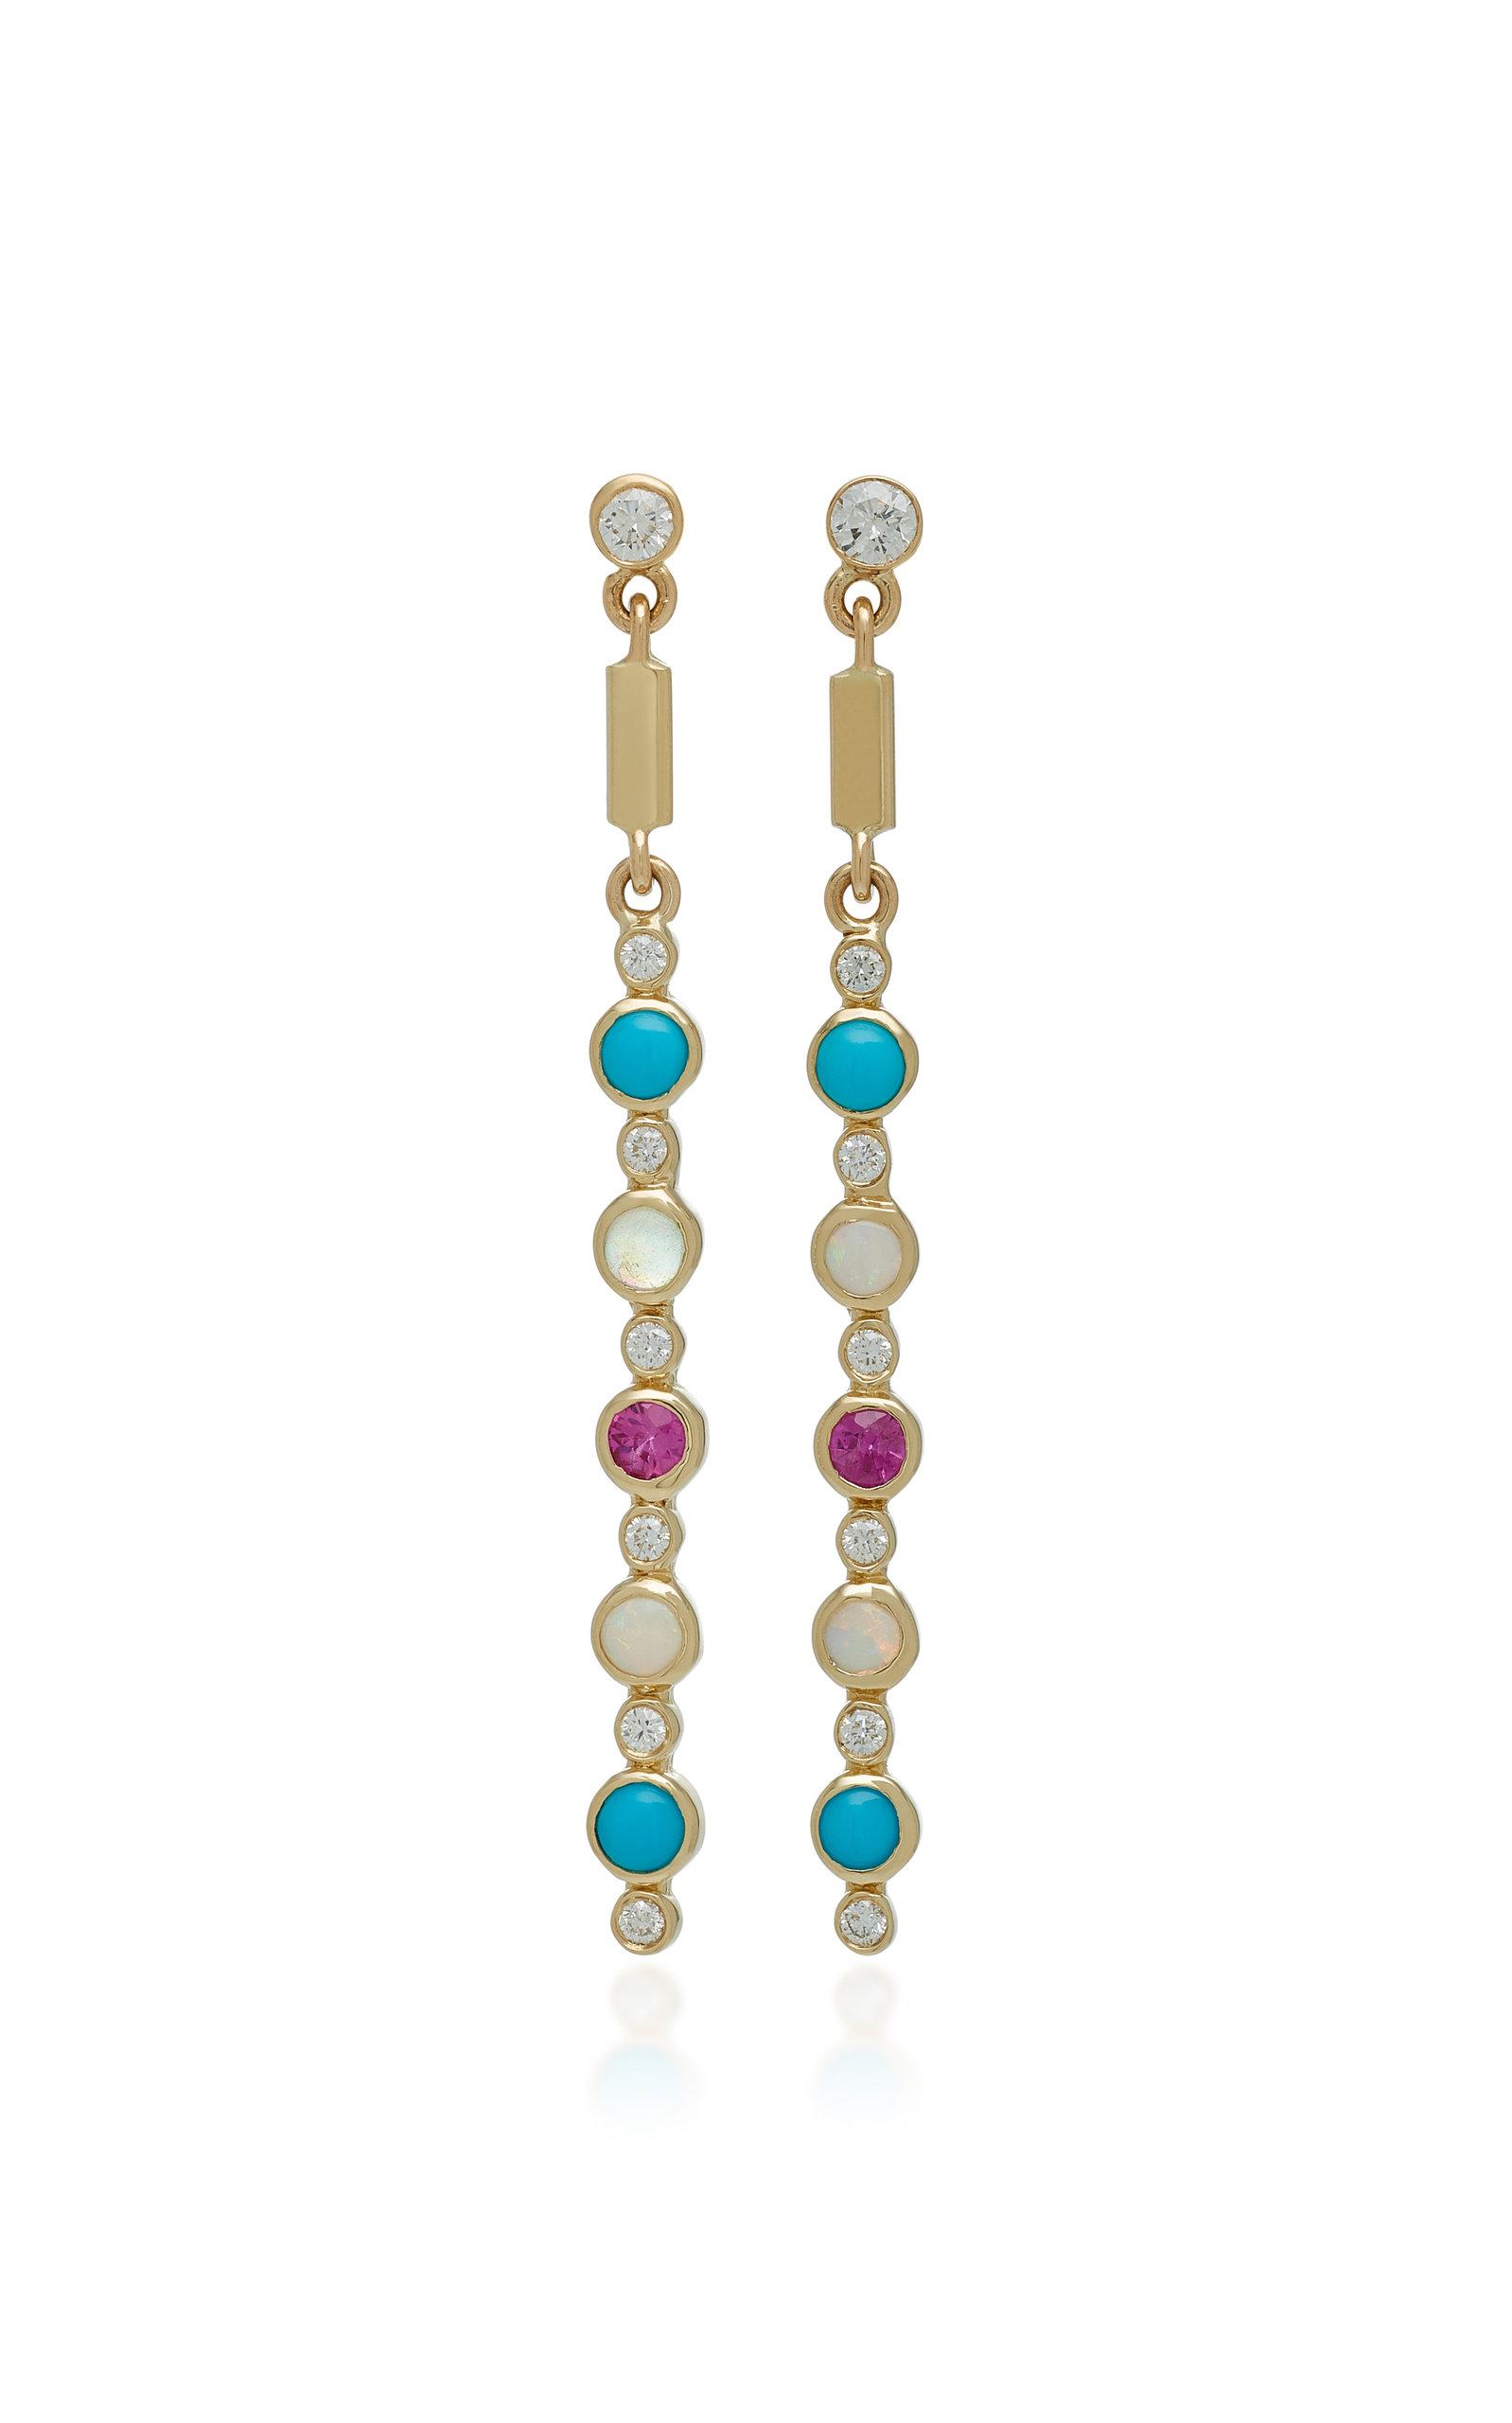 ILANA ARIEL Dot Matchstick 14K Gold Multi-Stone Earrings